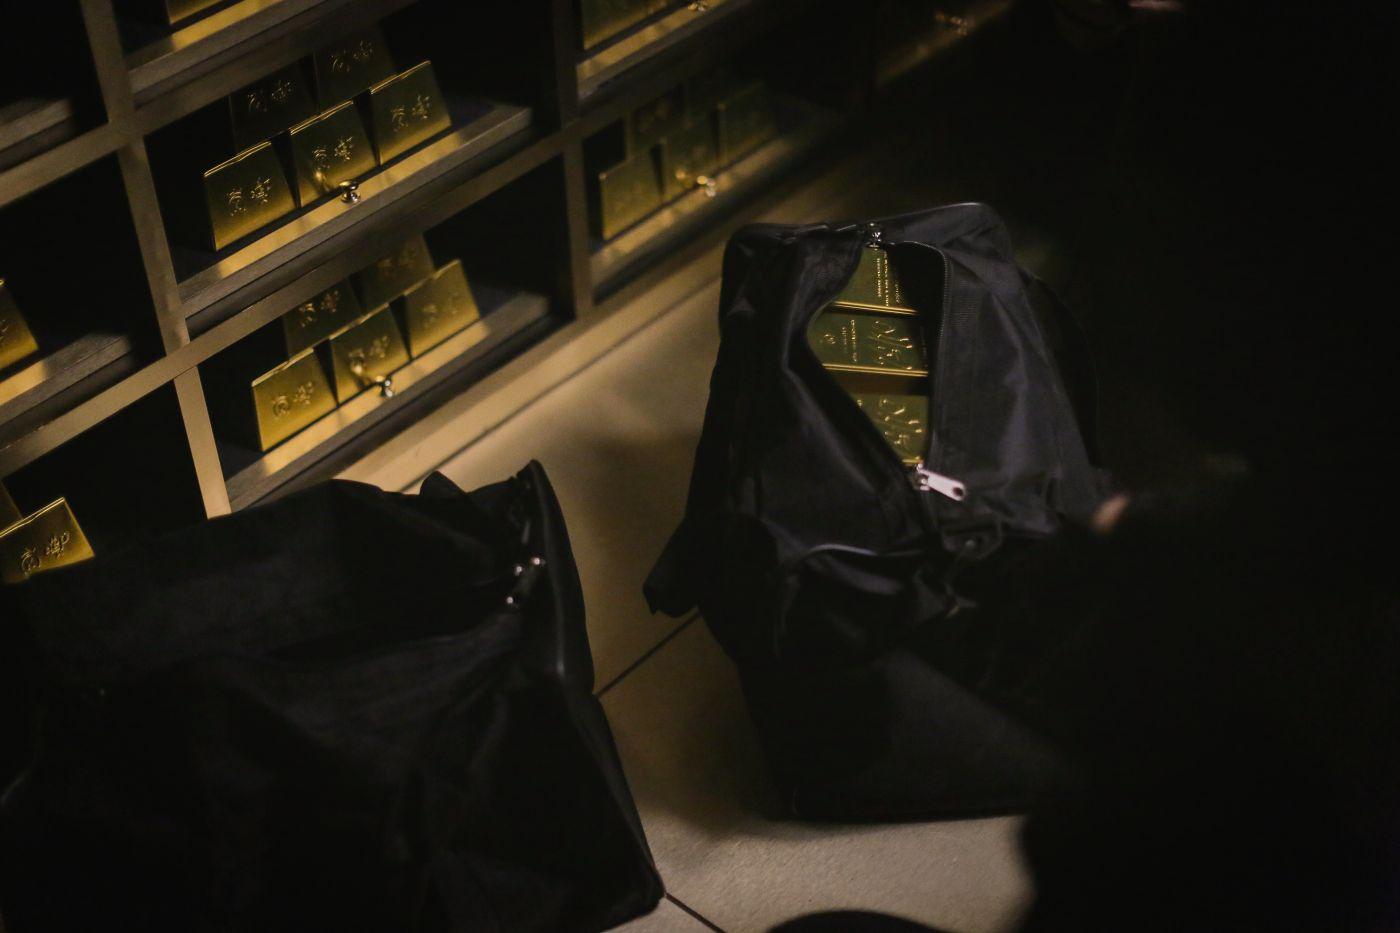 24 Kilates x Crep Protect 24/10 Gold Bar | Pro opravdové sneakers fanatiky